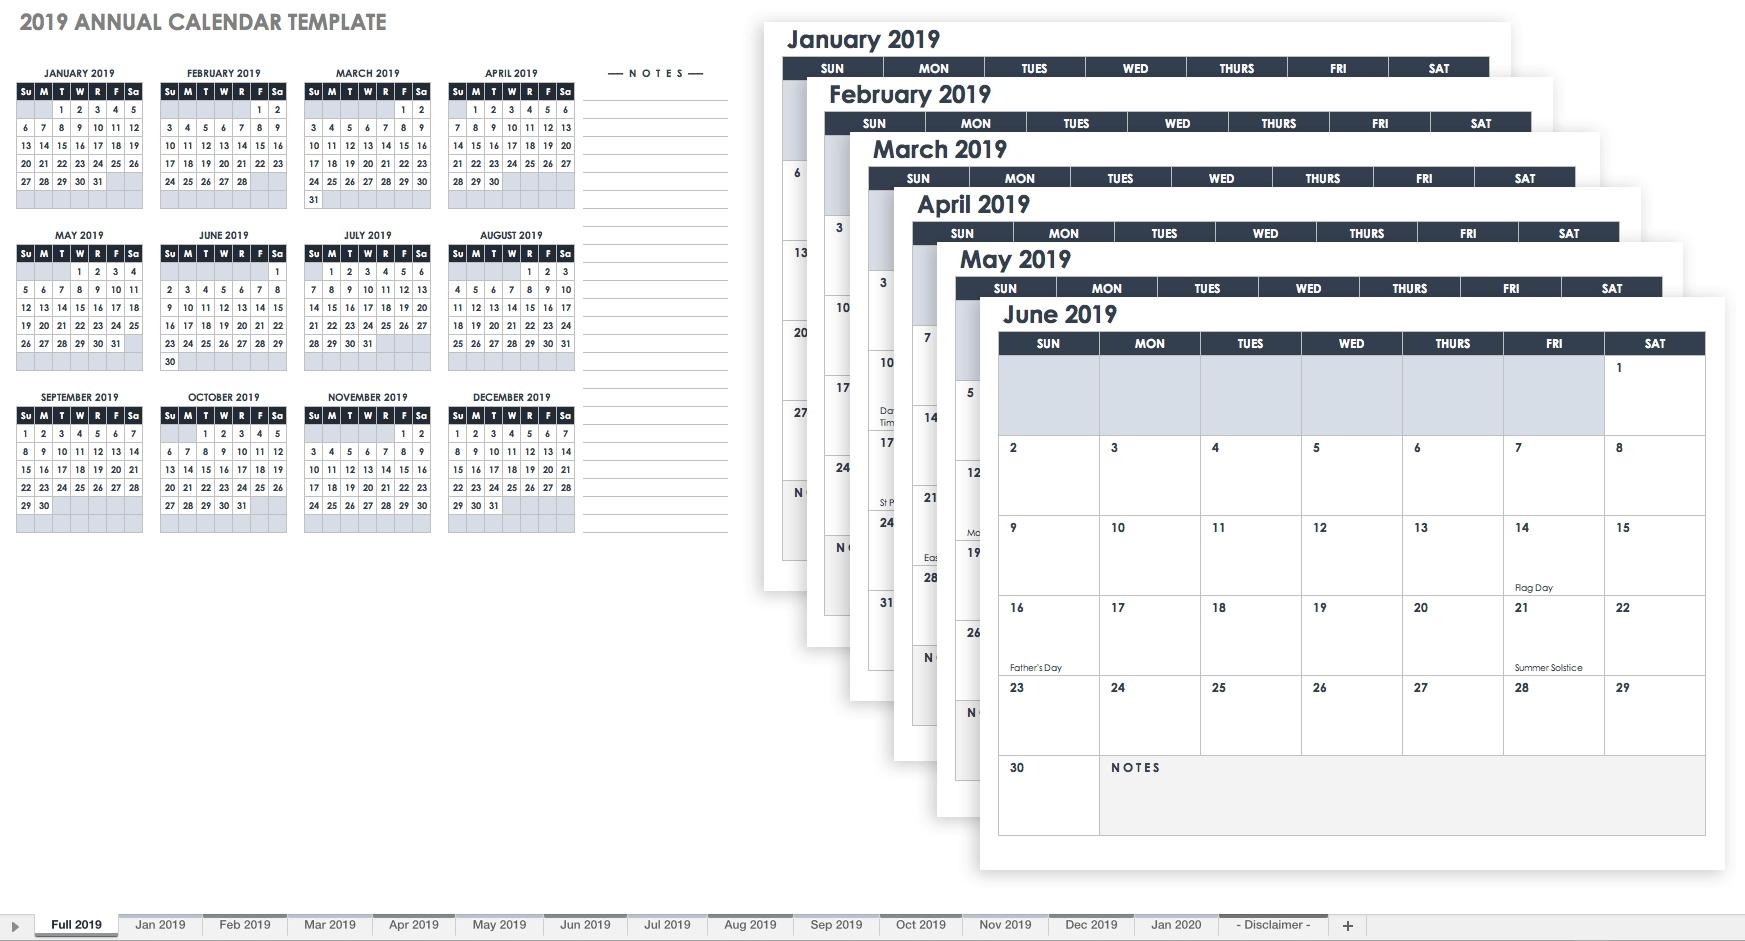 15 Free Monthly Calendar Templates | Smartsheet within Free Editable Monthly Calendar Printable